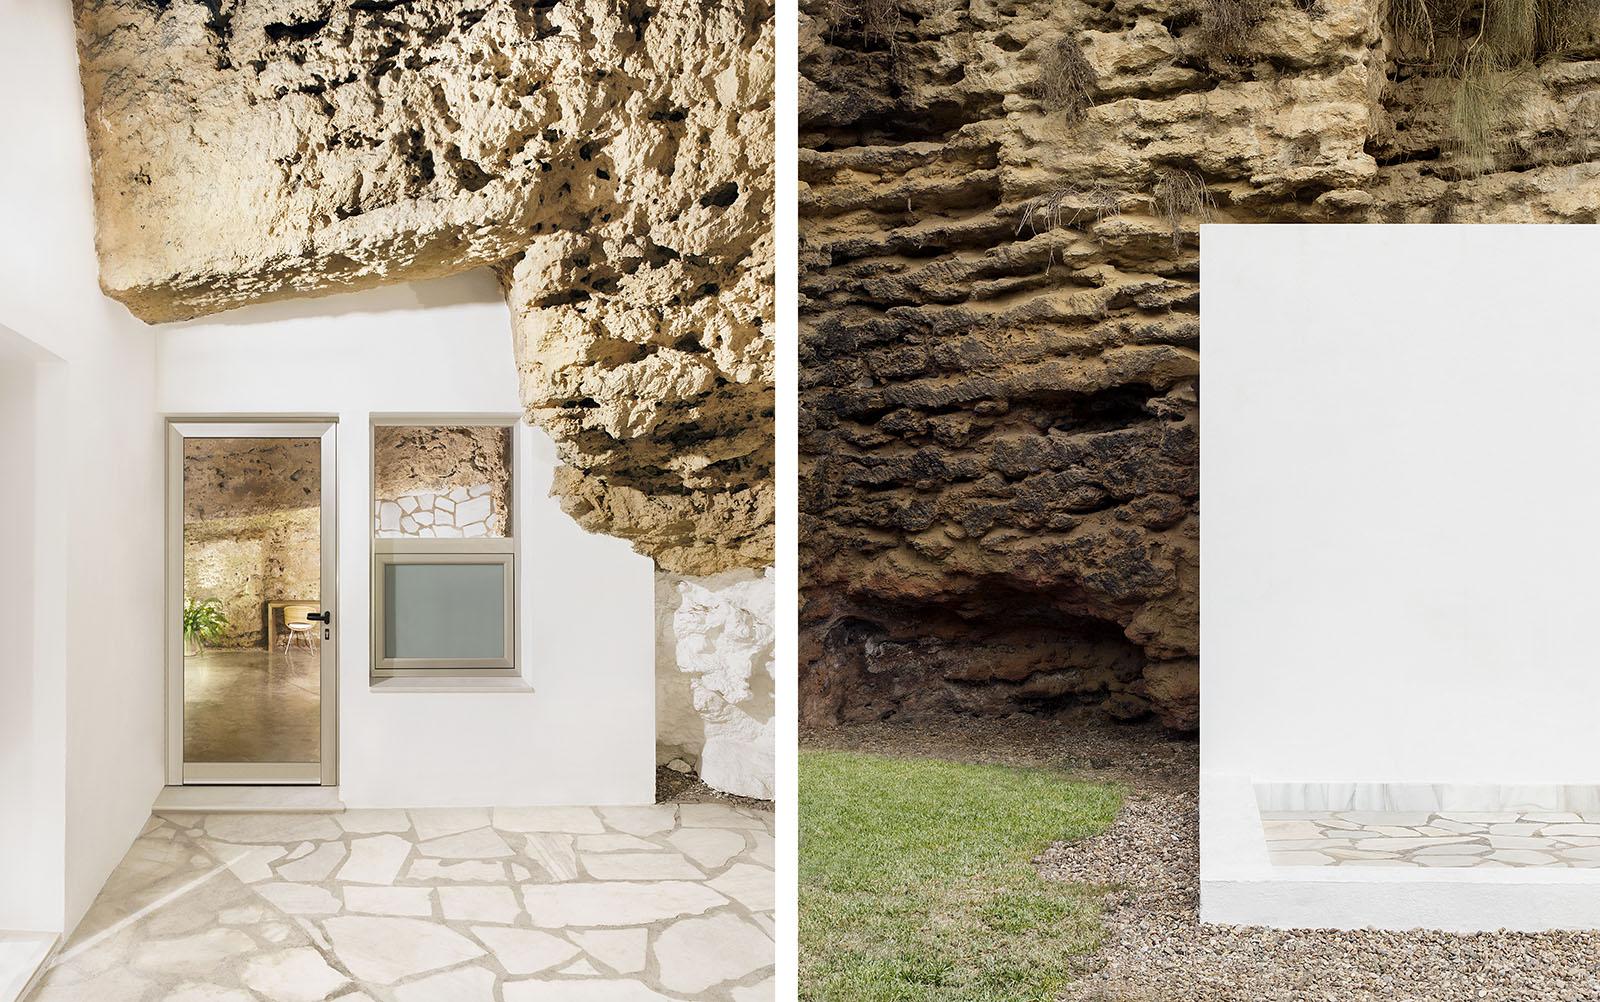 11. Cave House in Villarrubia Córdoba - Casa Tierra: a Cave House in Córdoba by UMMO Estudio